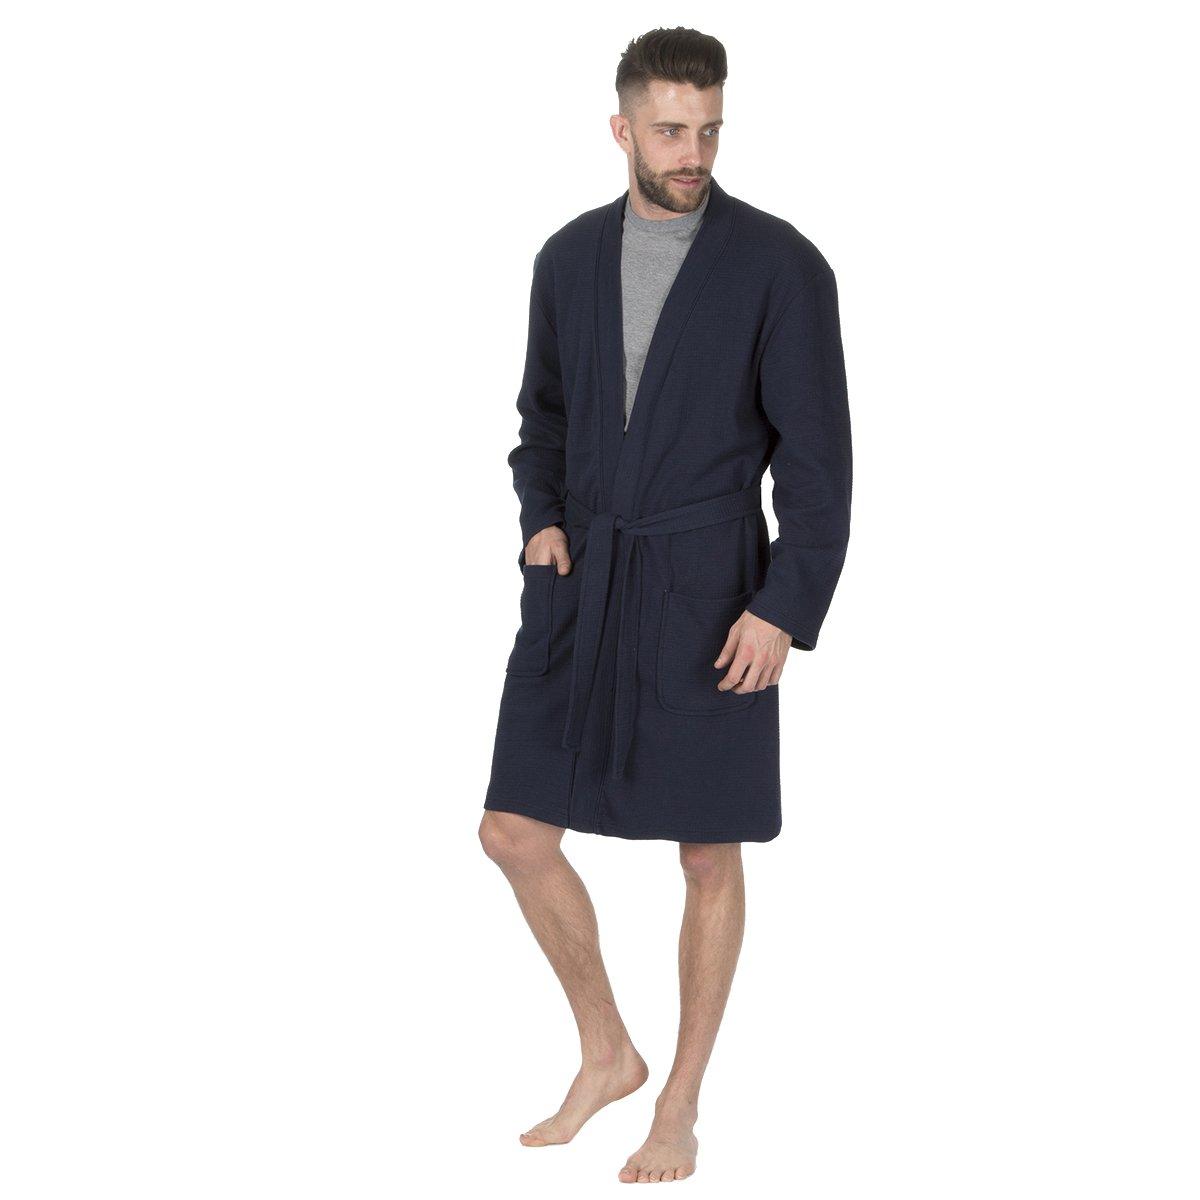 Men's Luxury Towelling Bath Robe Cotton Blend Waffle Weave Kimono Gown House Coat Navy Large